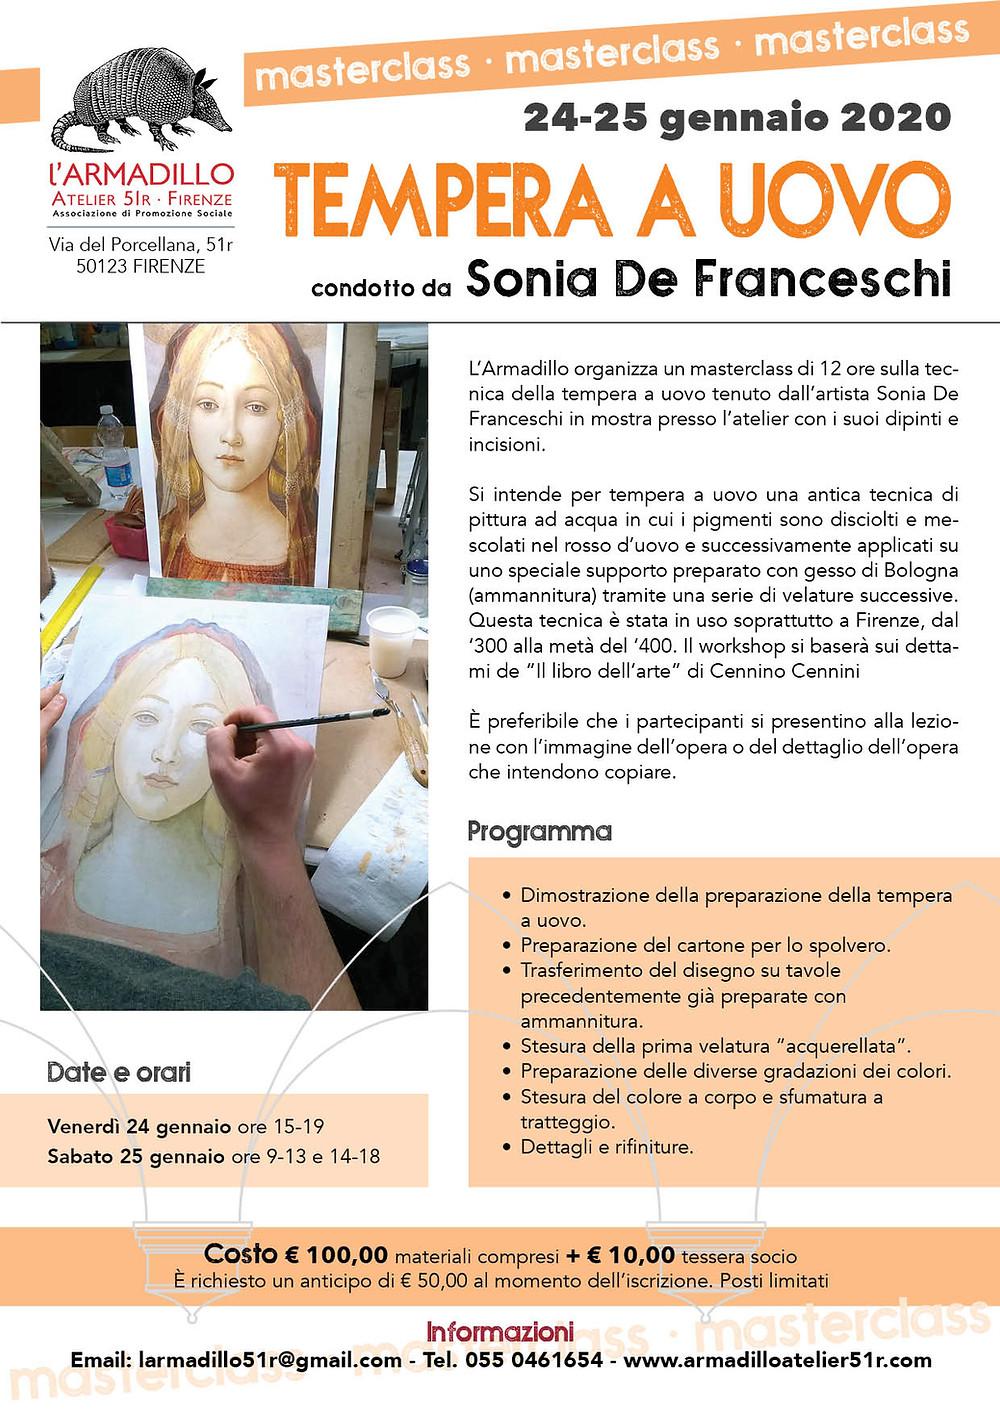 Masterclass sulla Tempera a uovo con Sonia De Franceschi